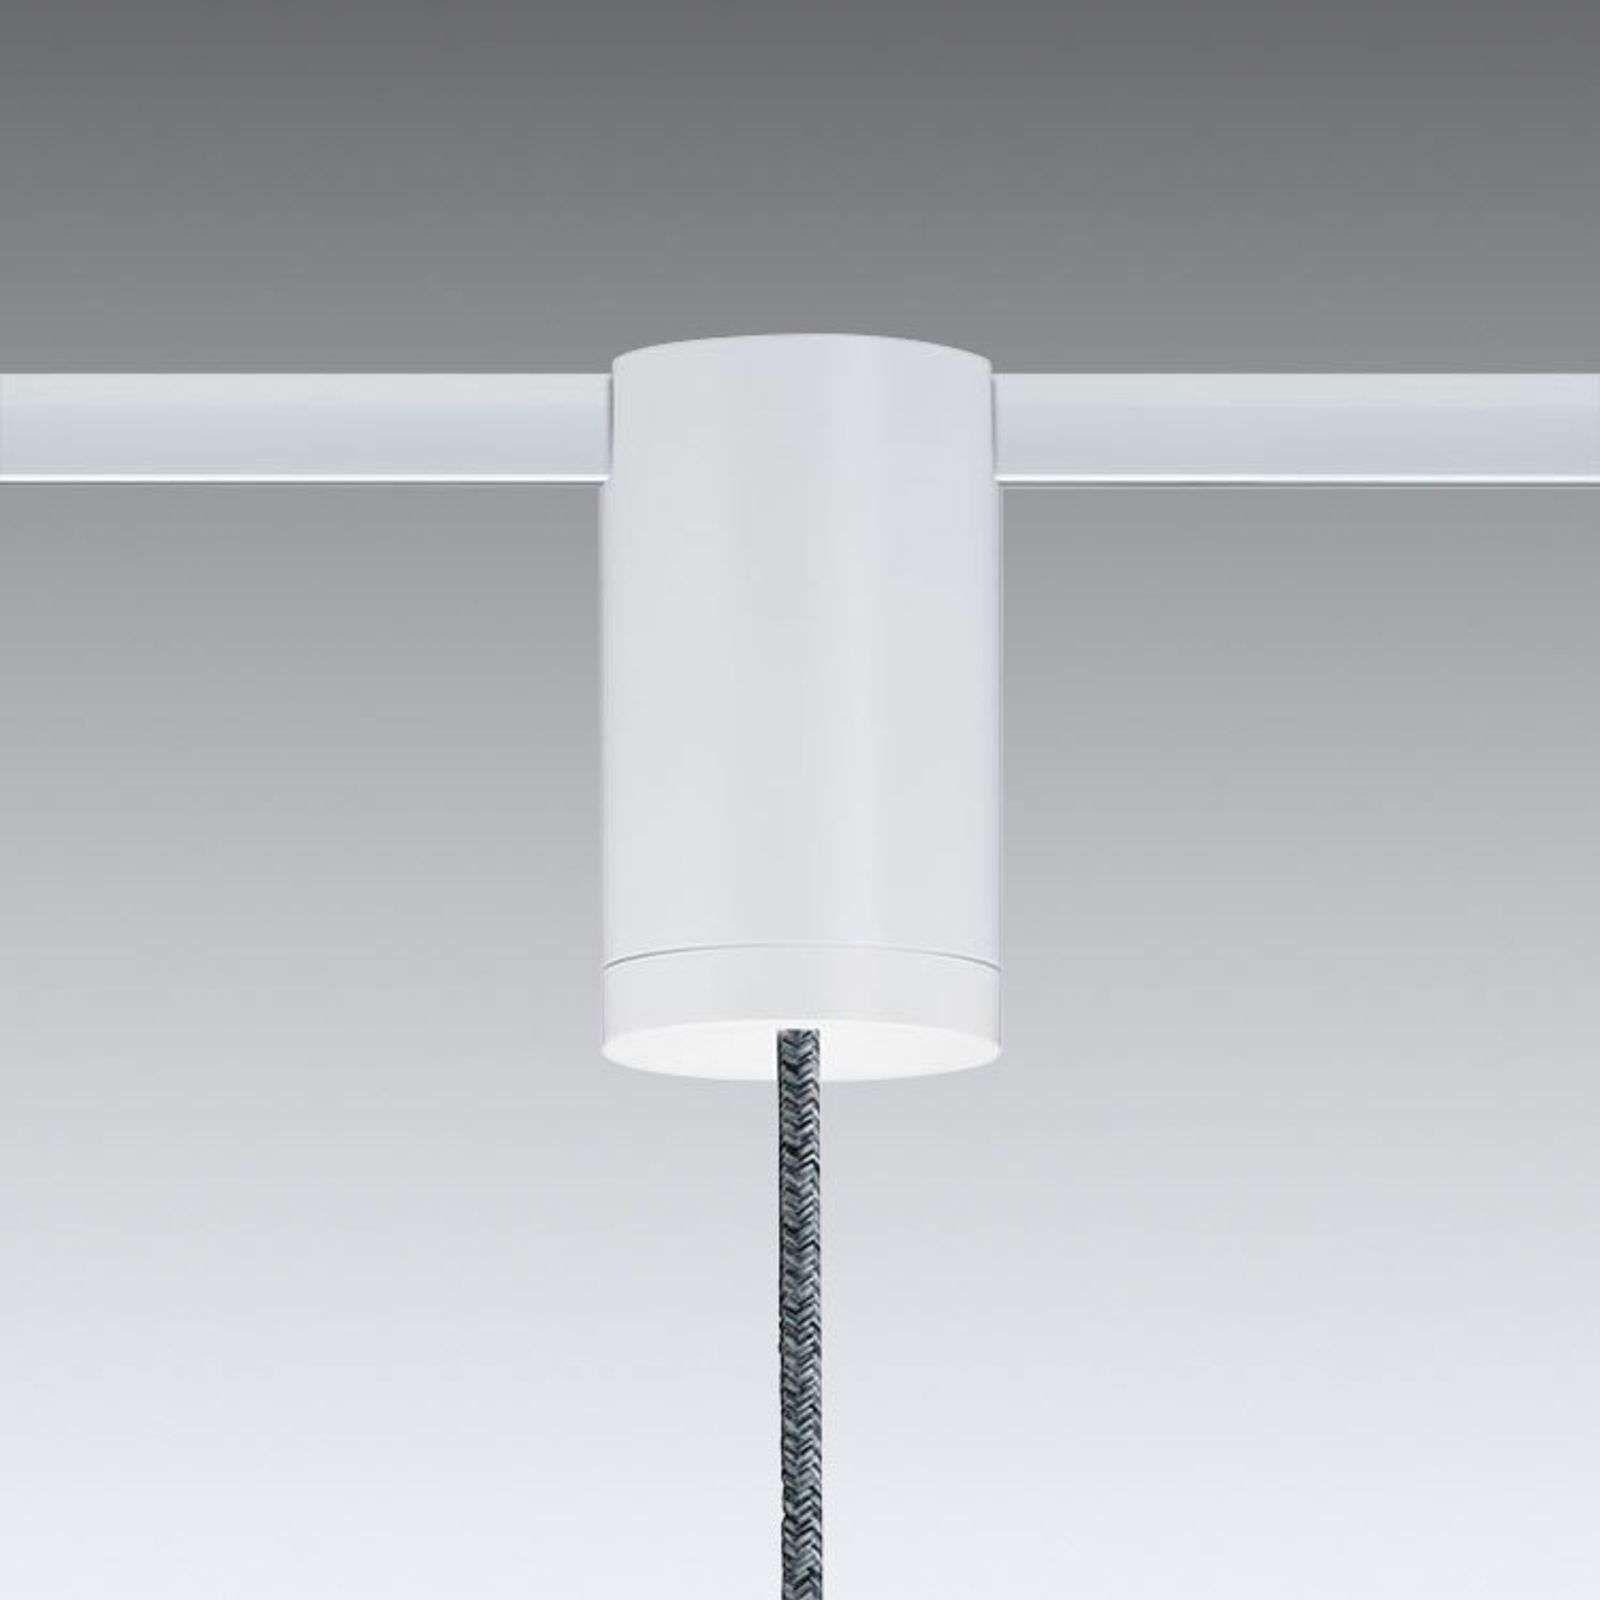 Flex Pendeladapter Voor Urail Railsysteem Wit In 2020 Wit Binnenverlichting Metaal